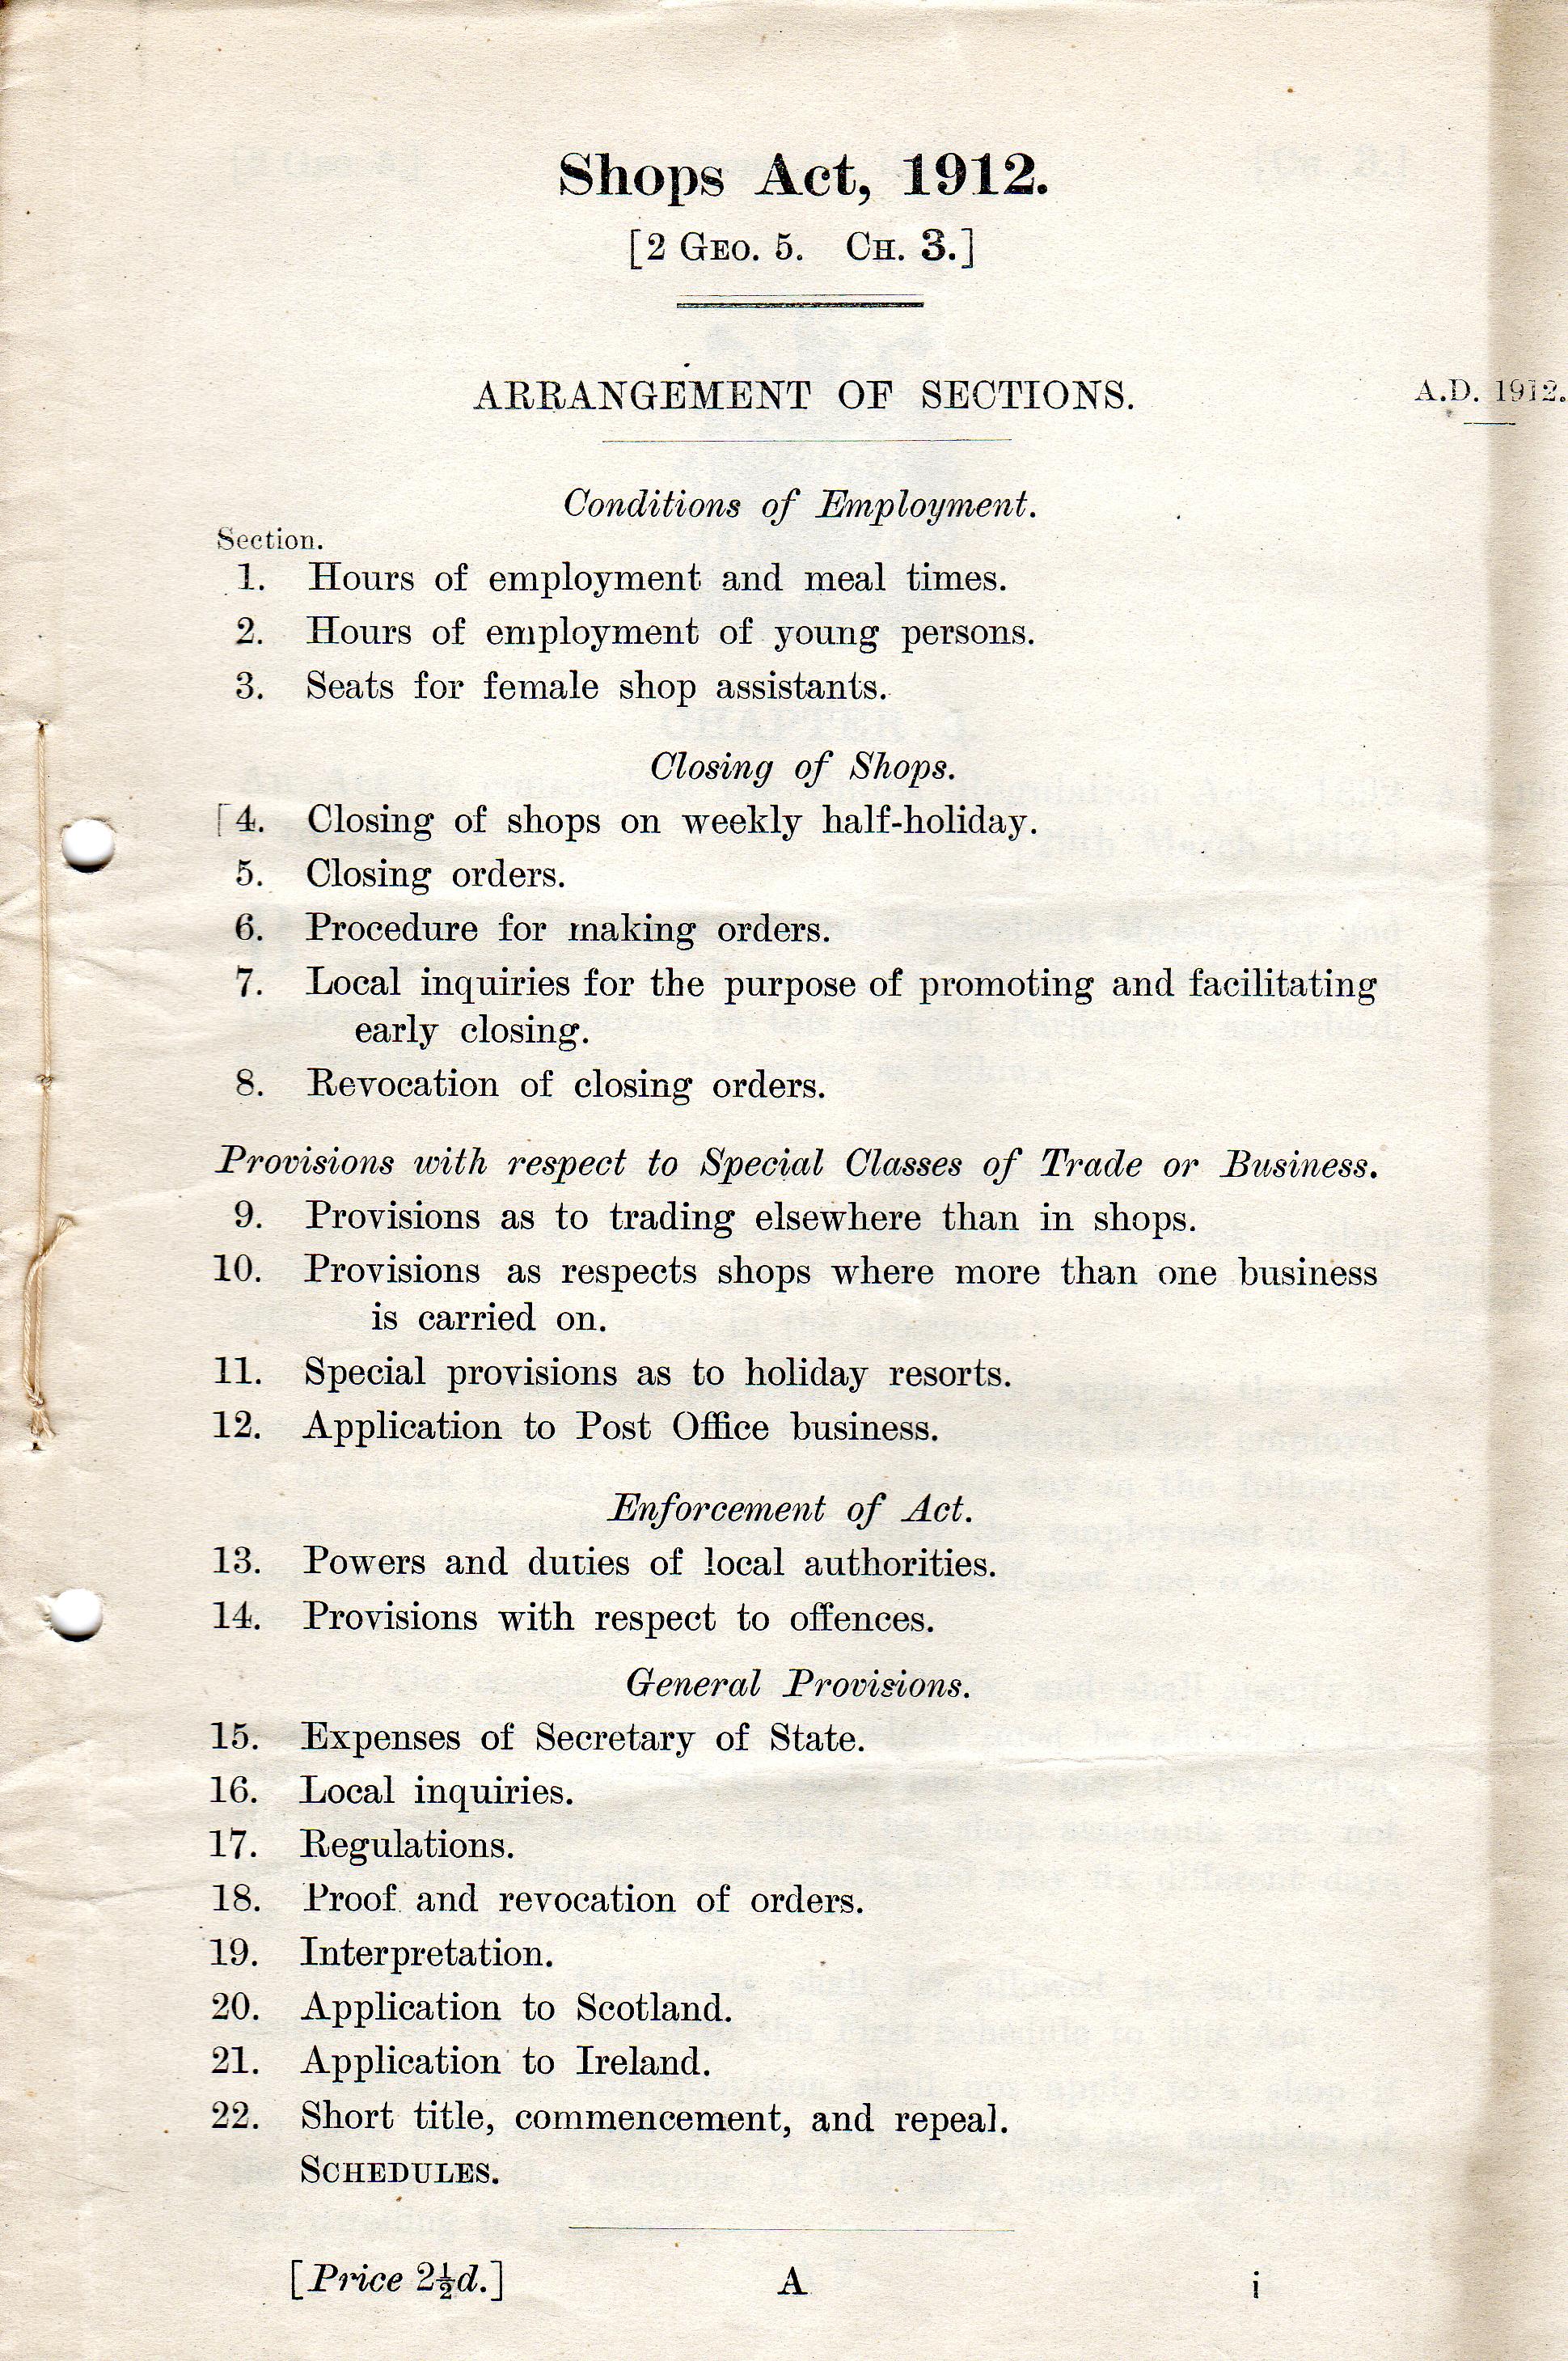 1912 Shops Act.jpg